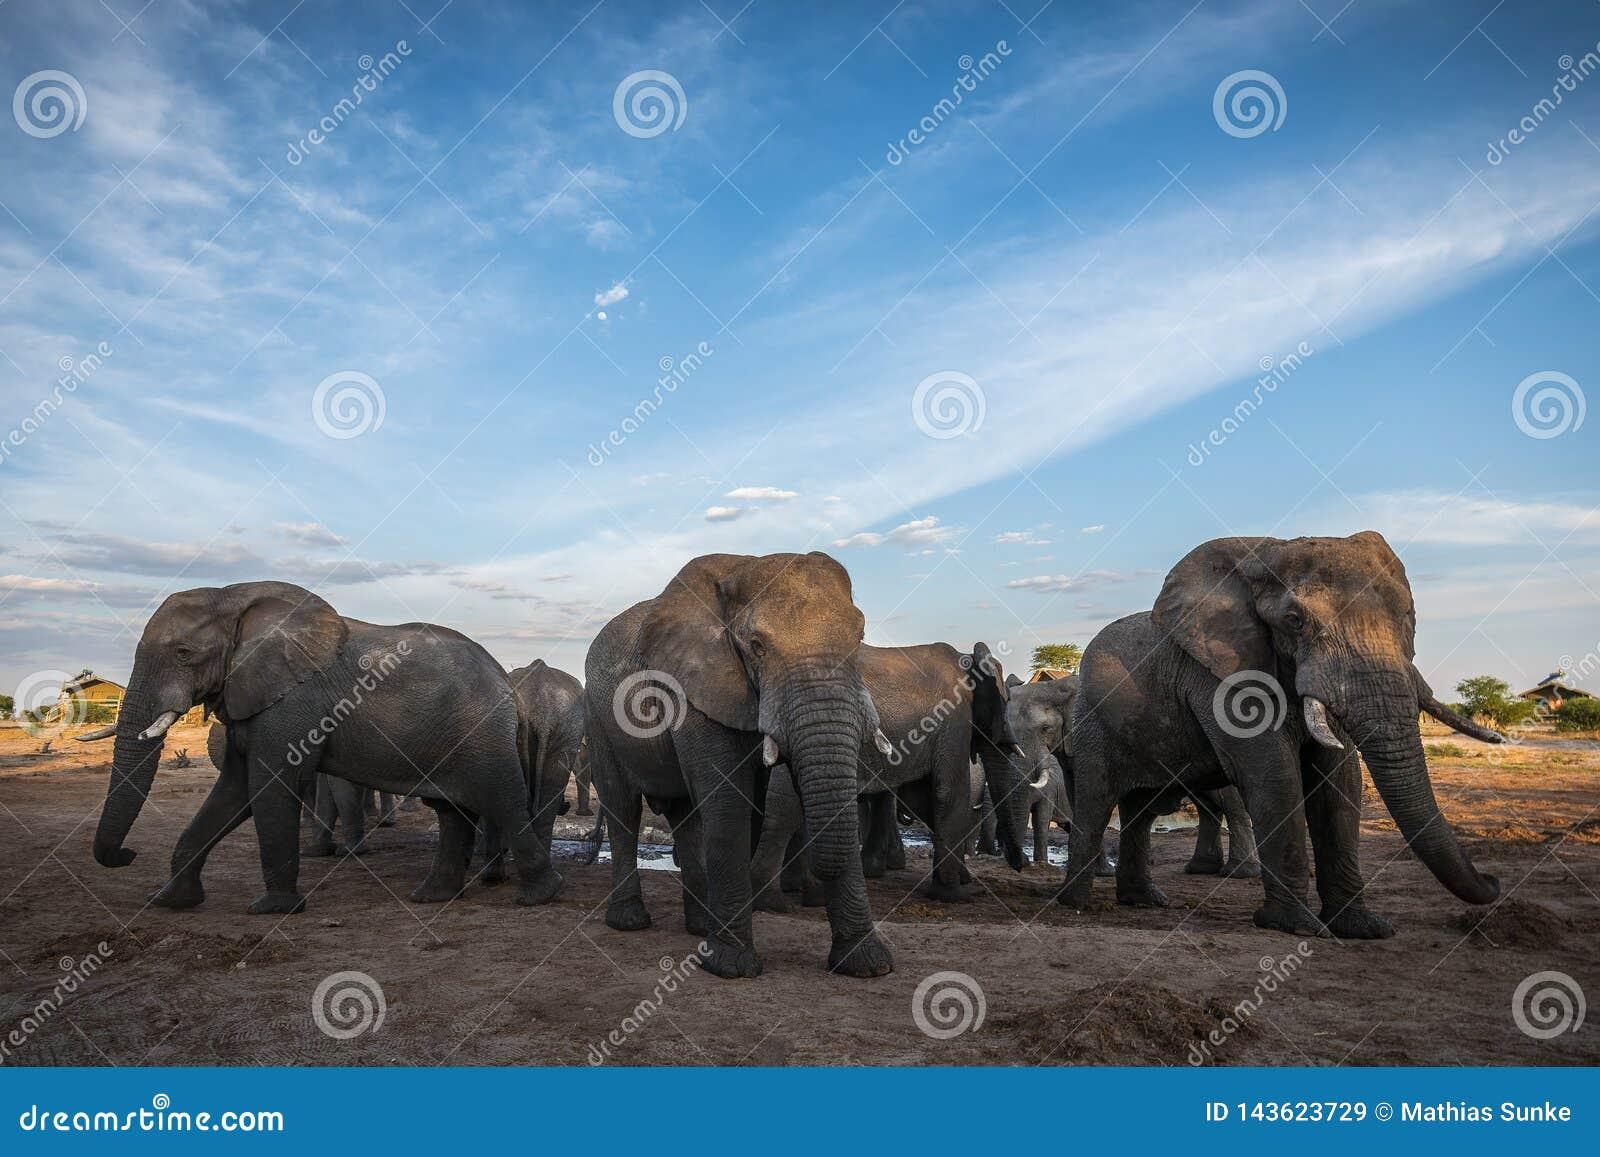 Elephant gathering at a waterhole